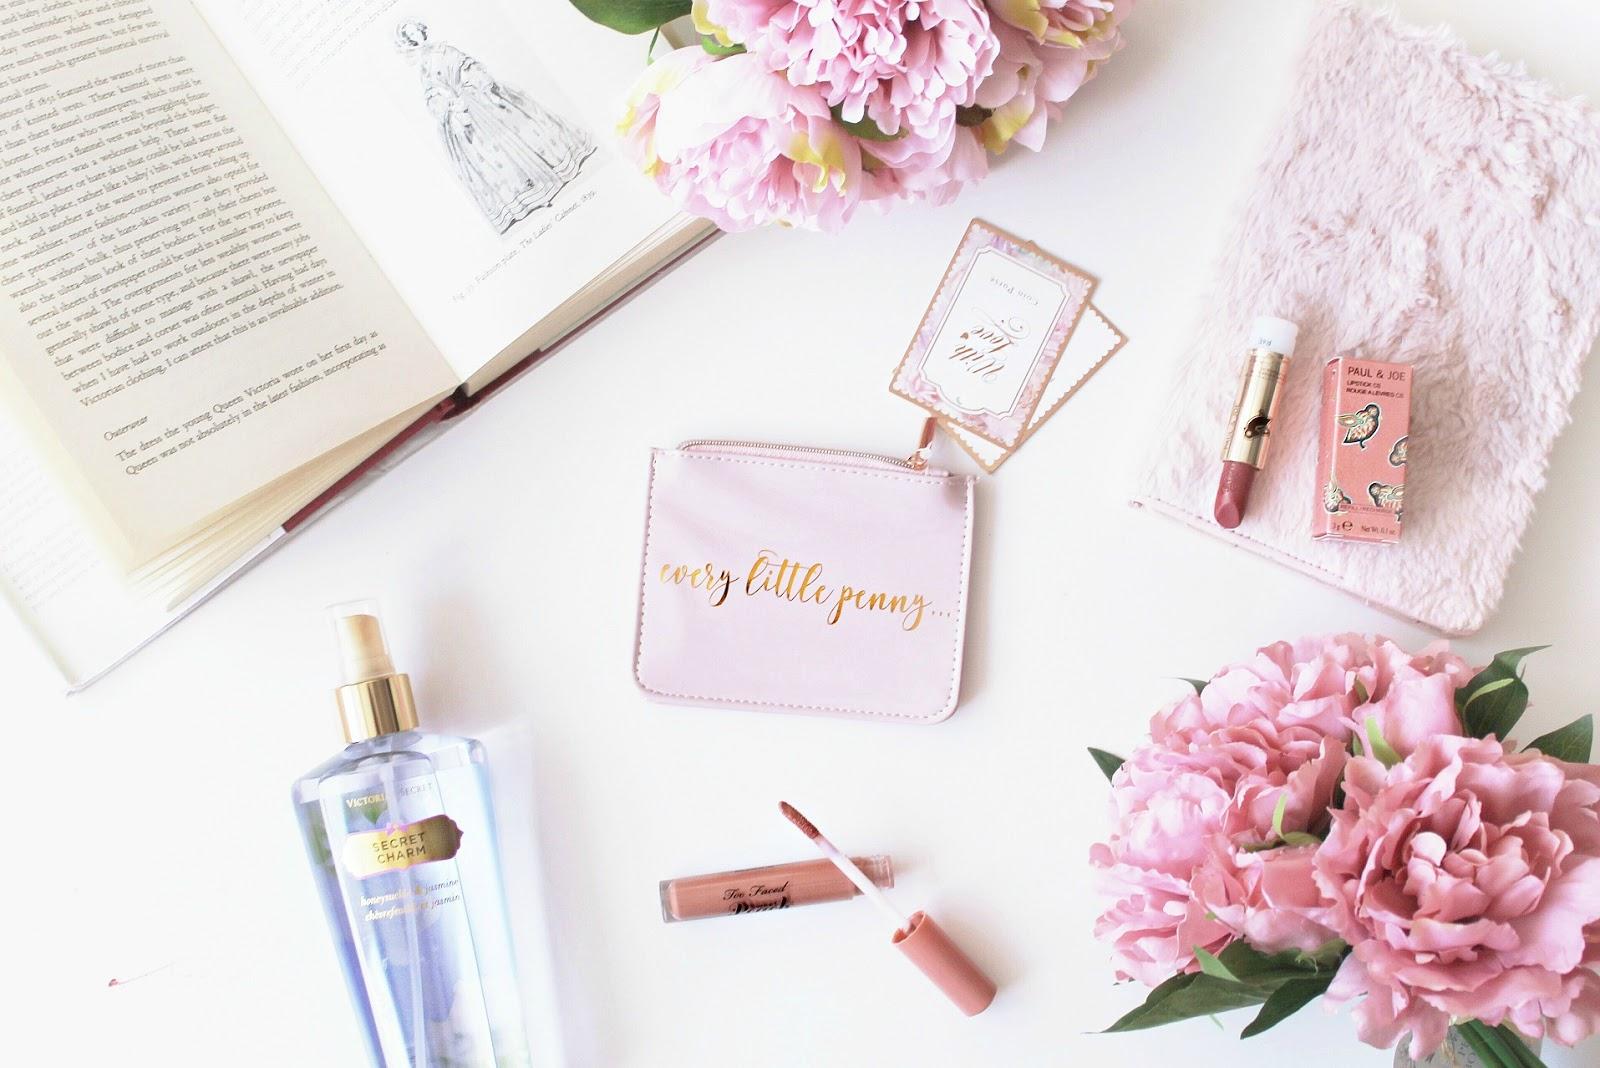 Spring beauty blog haul